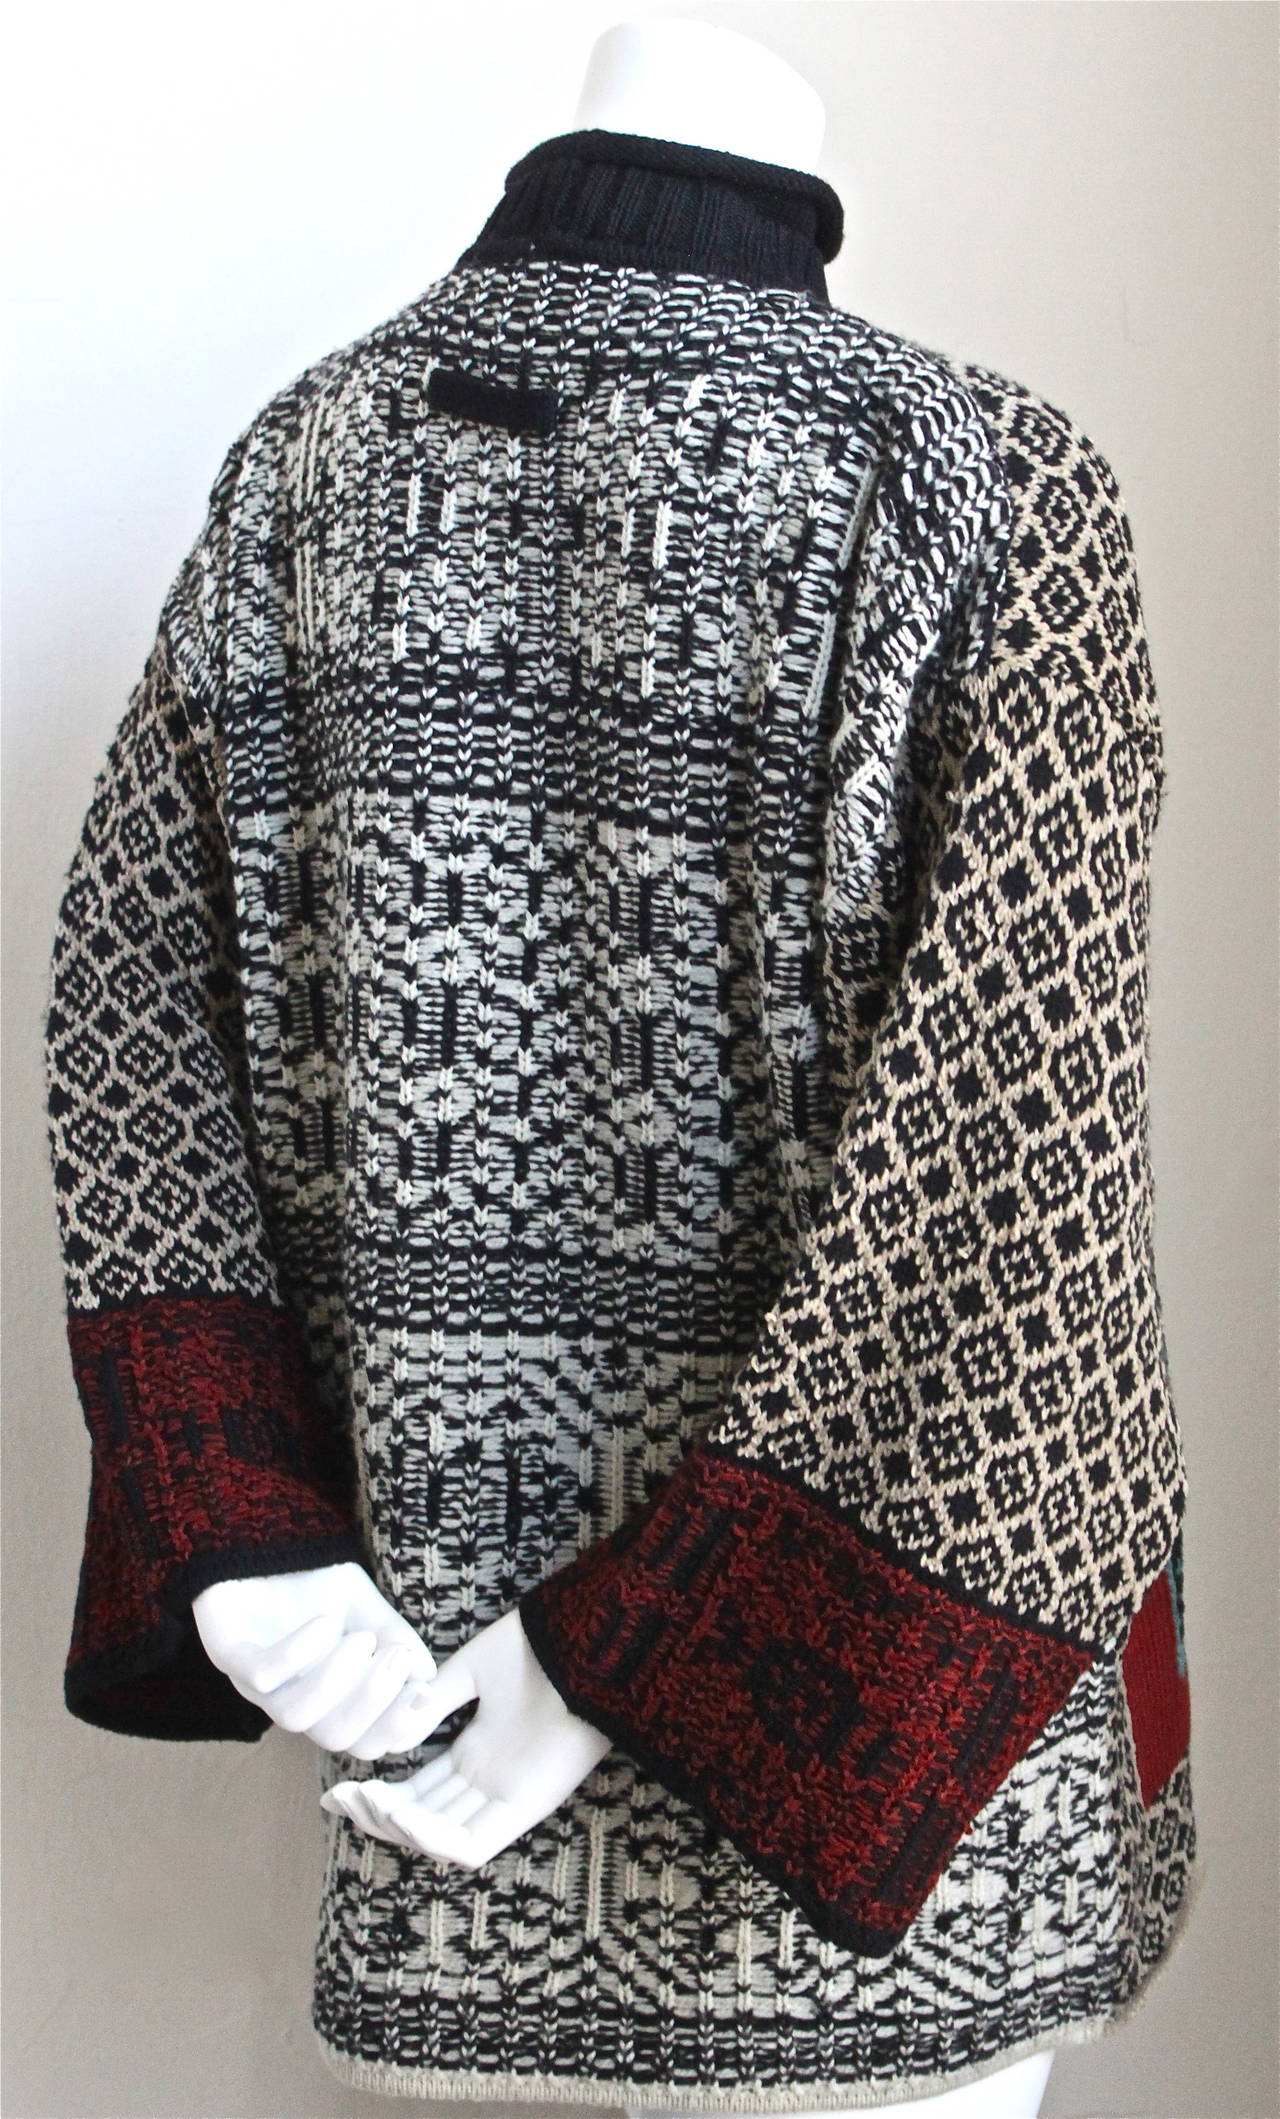 1994 JEAN PAUL GAULTIER 'le grande voyage' runway sweater. 2